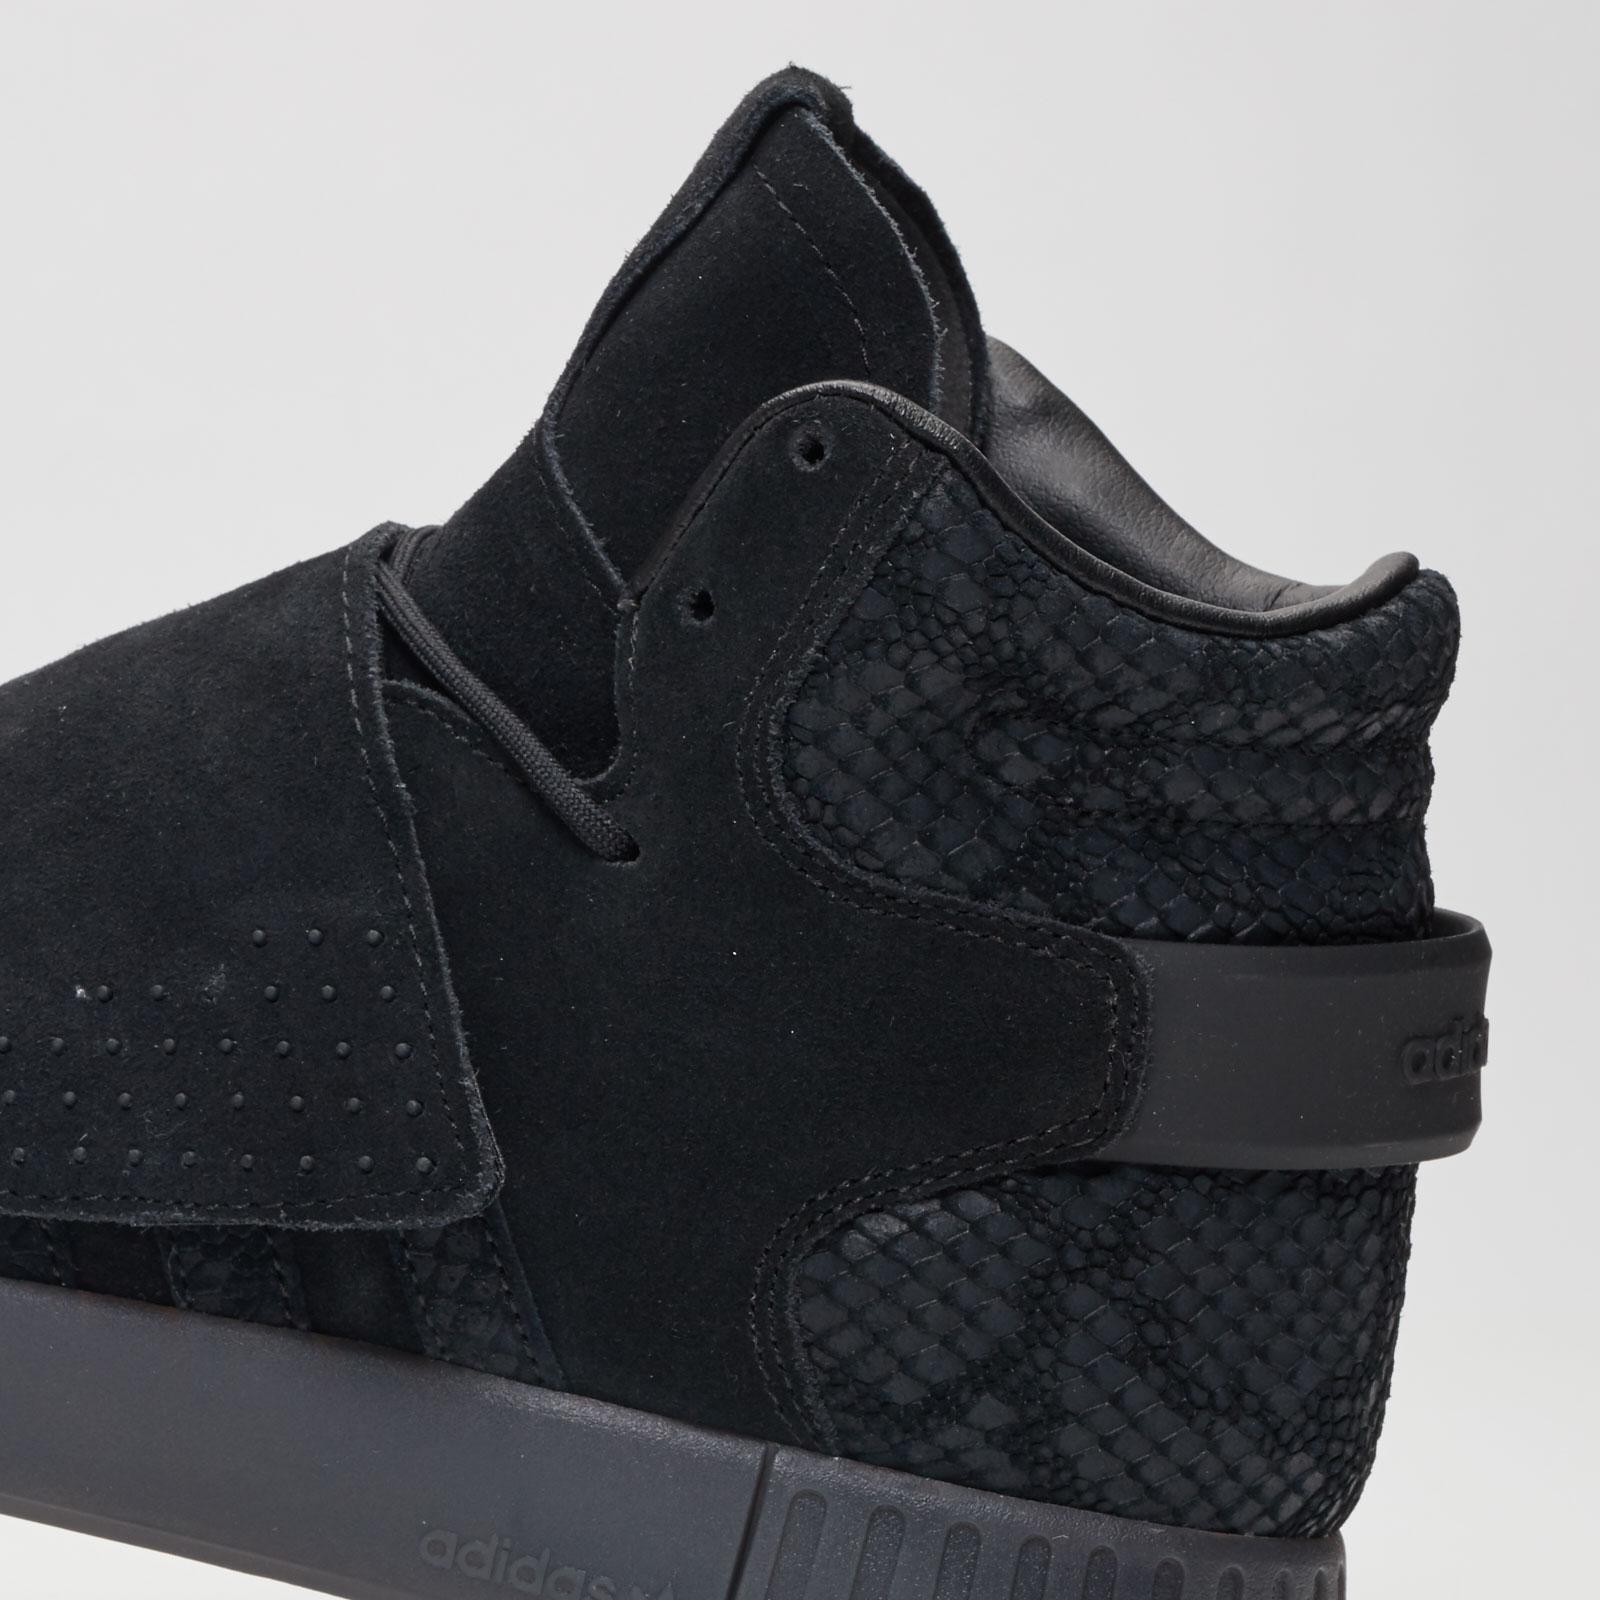 78028e440a515a adidas Tubular Invader Strap - Bb8392 - Sneakersnstuff